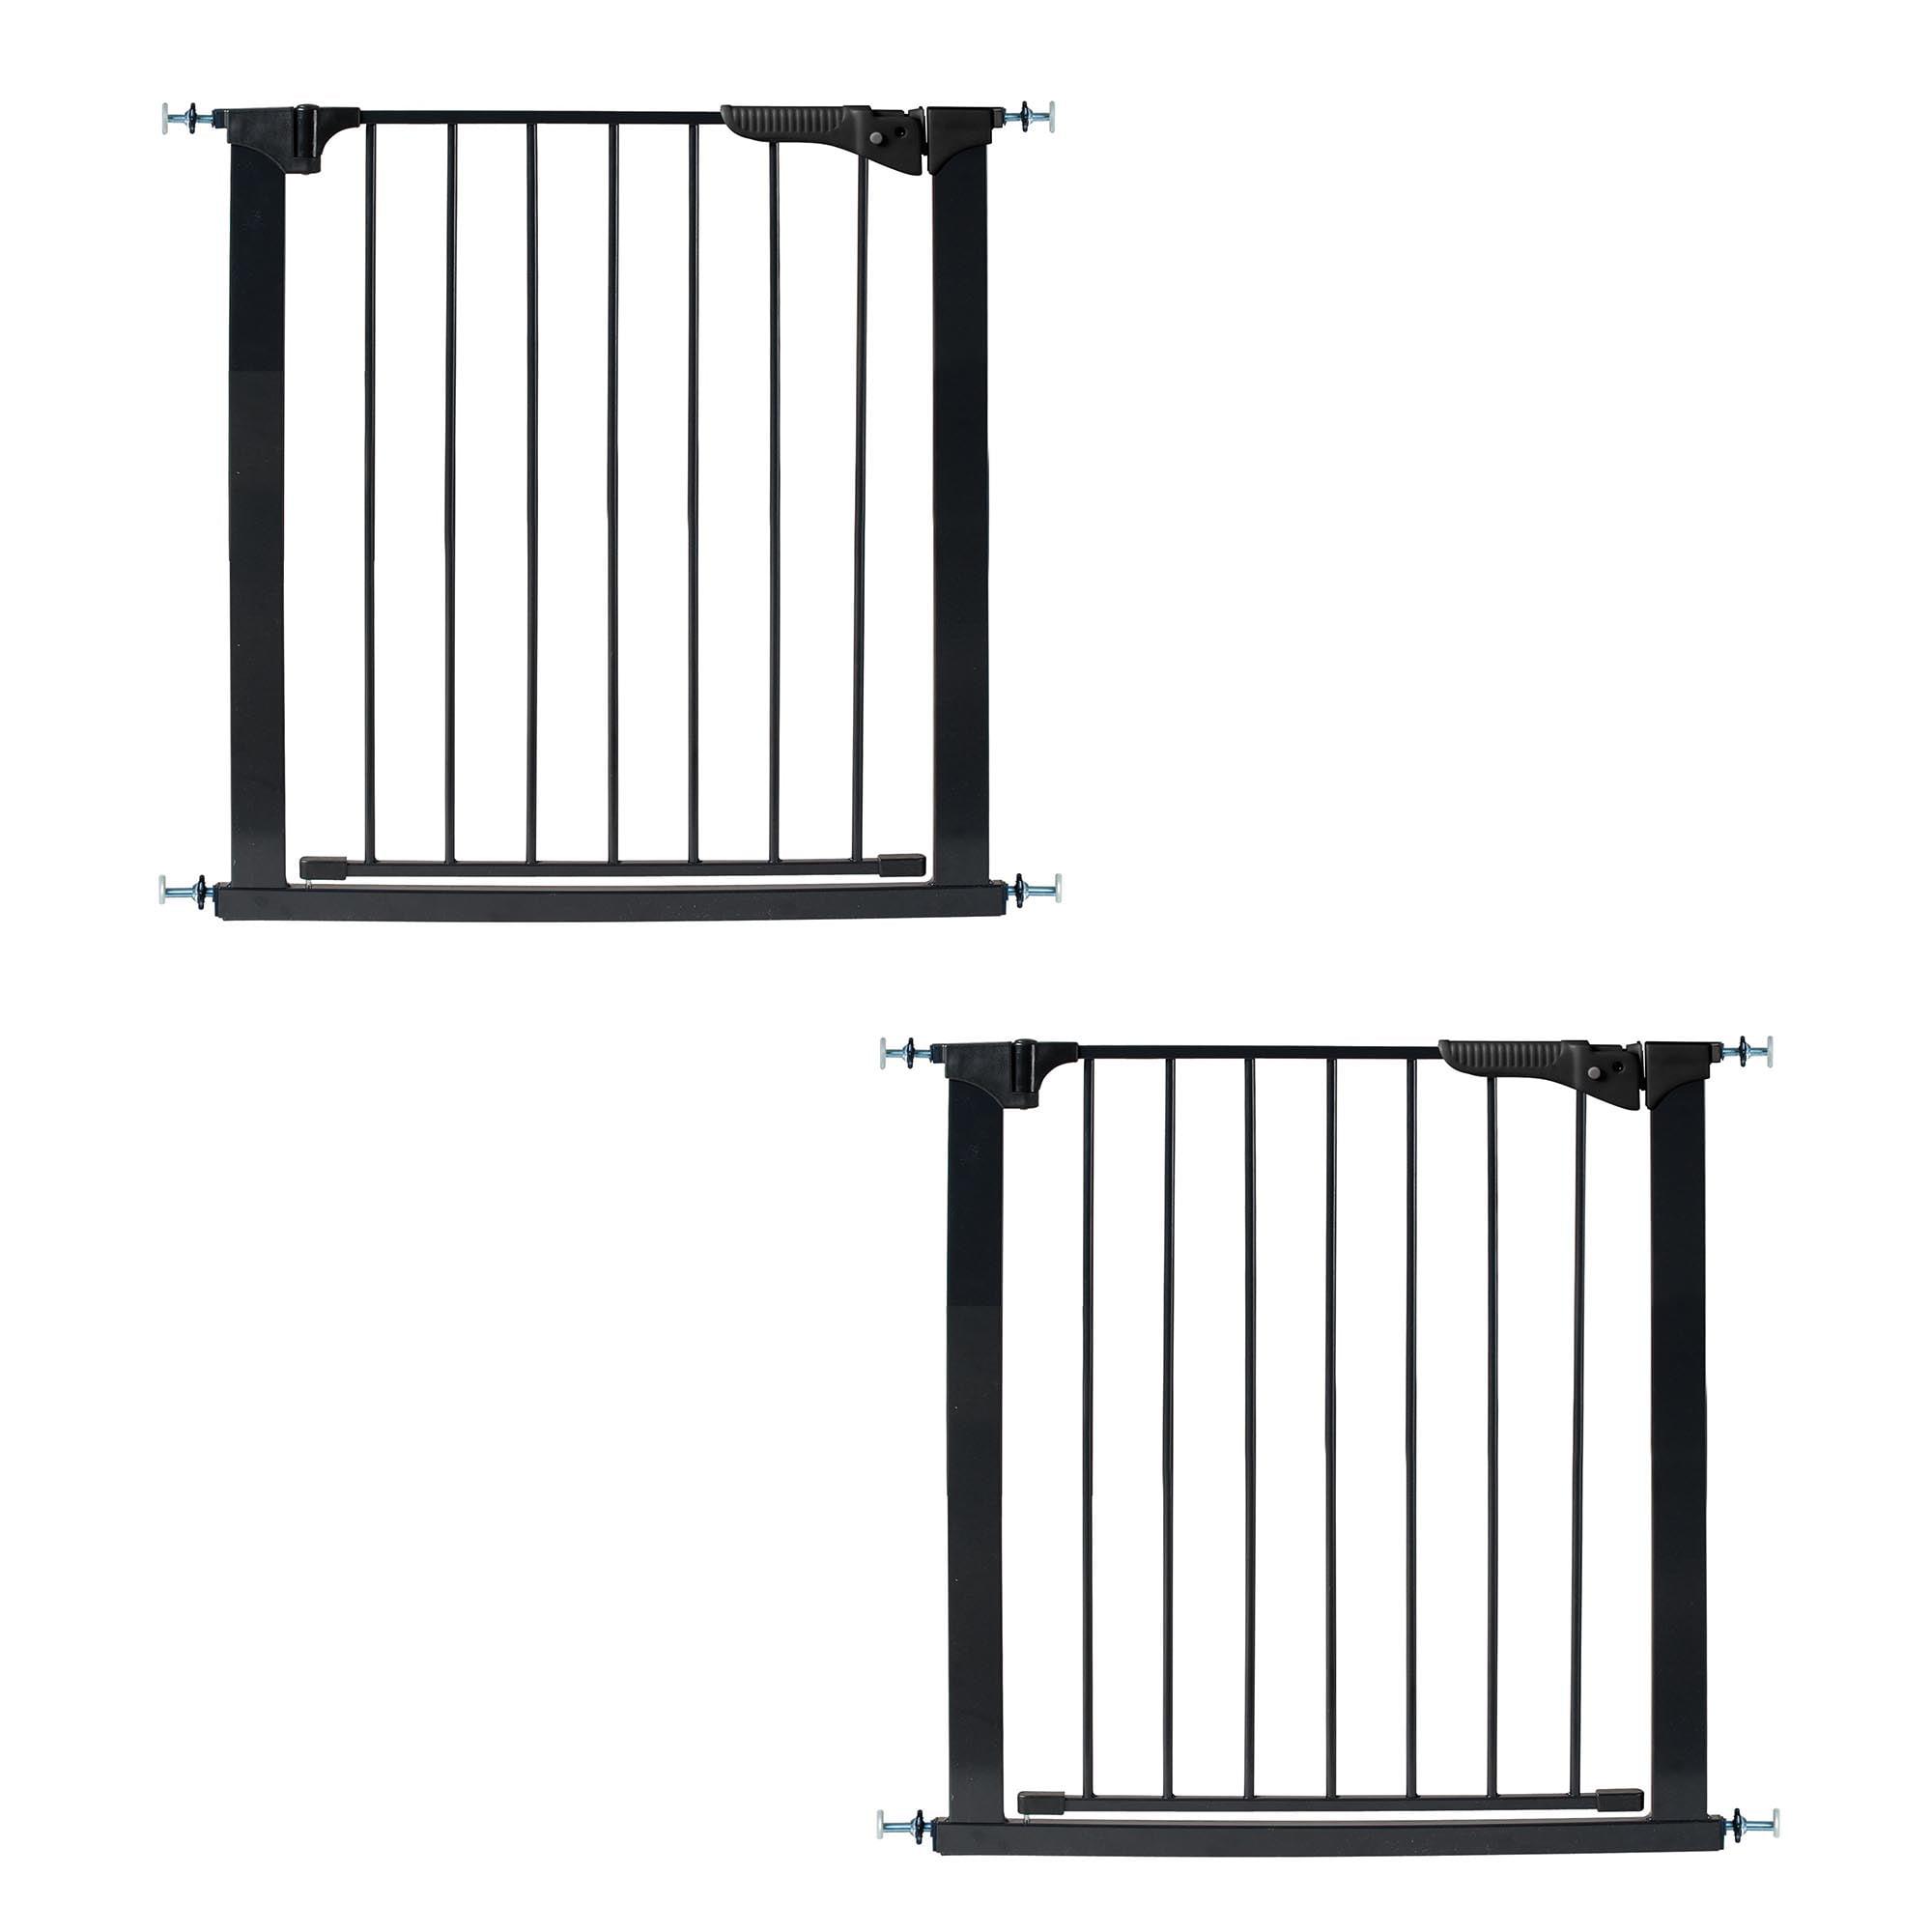 KidCo G1001 Gateway Steel Baby and Kids Doorway Safety Gate, Black (2 Pack) by Kidco